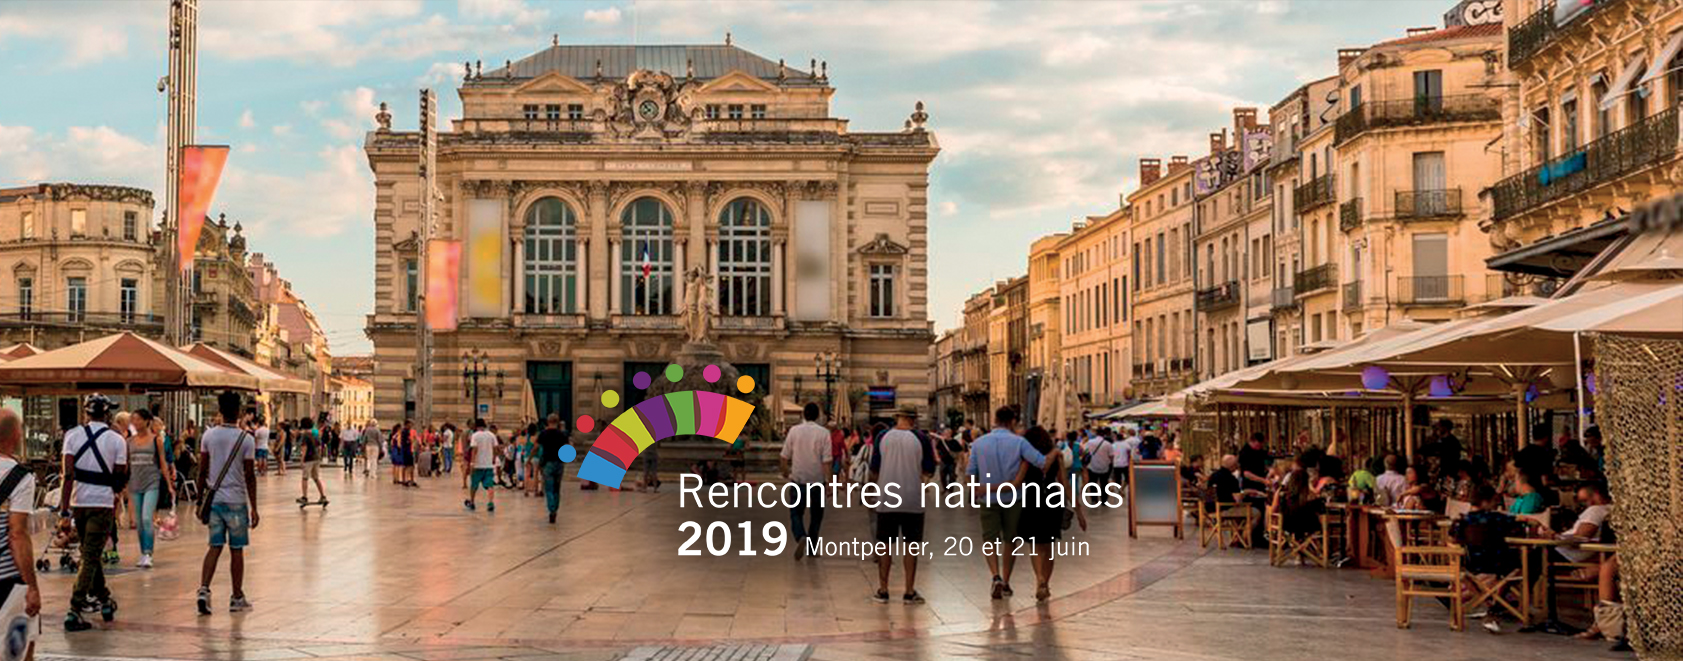 Rencontres nationales 2019 : le programme complet